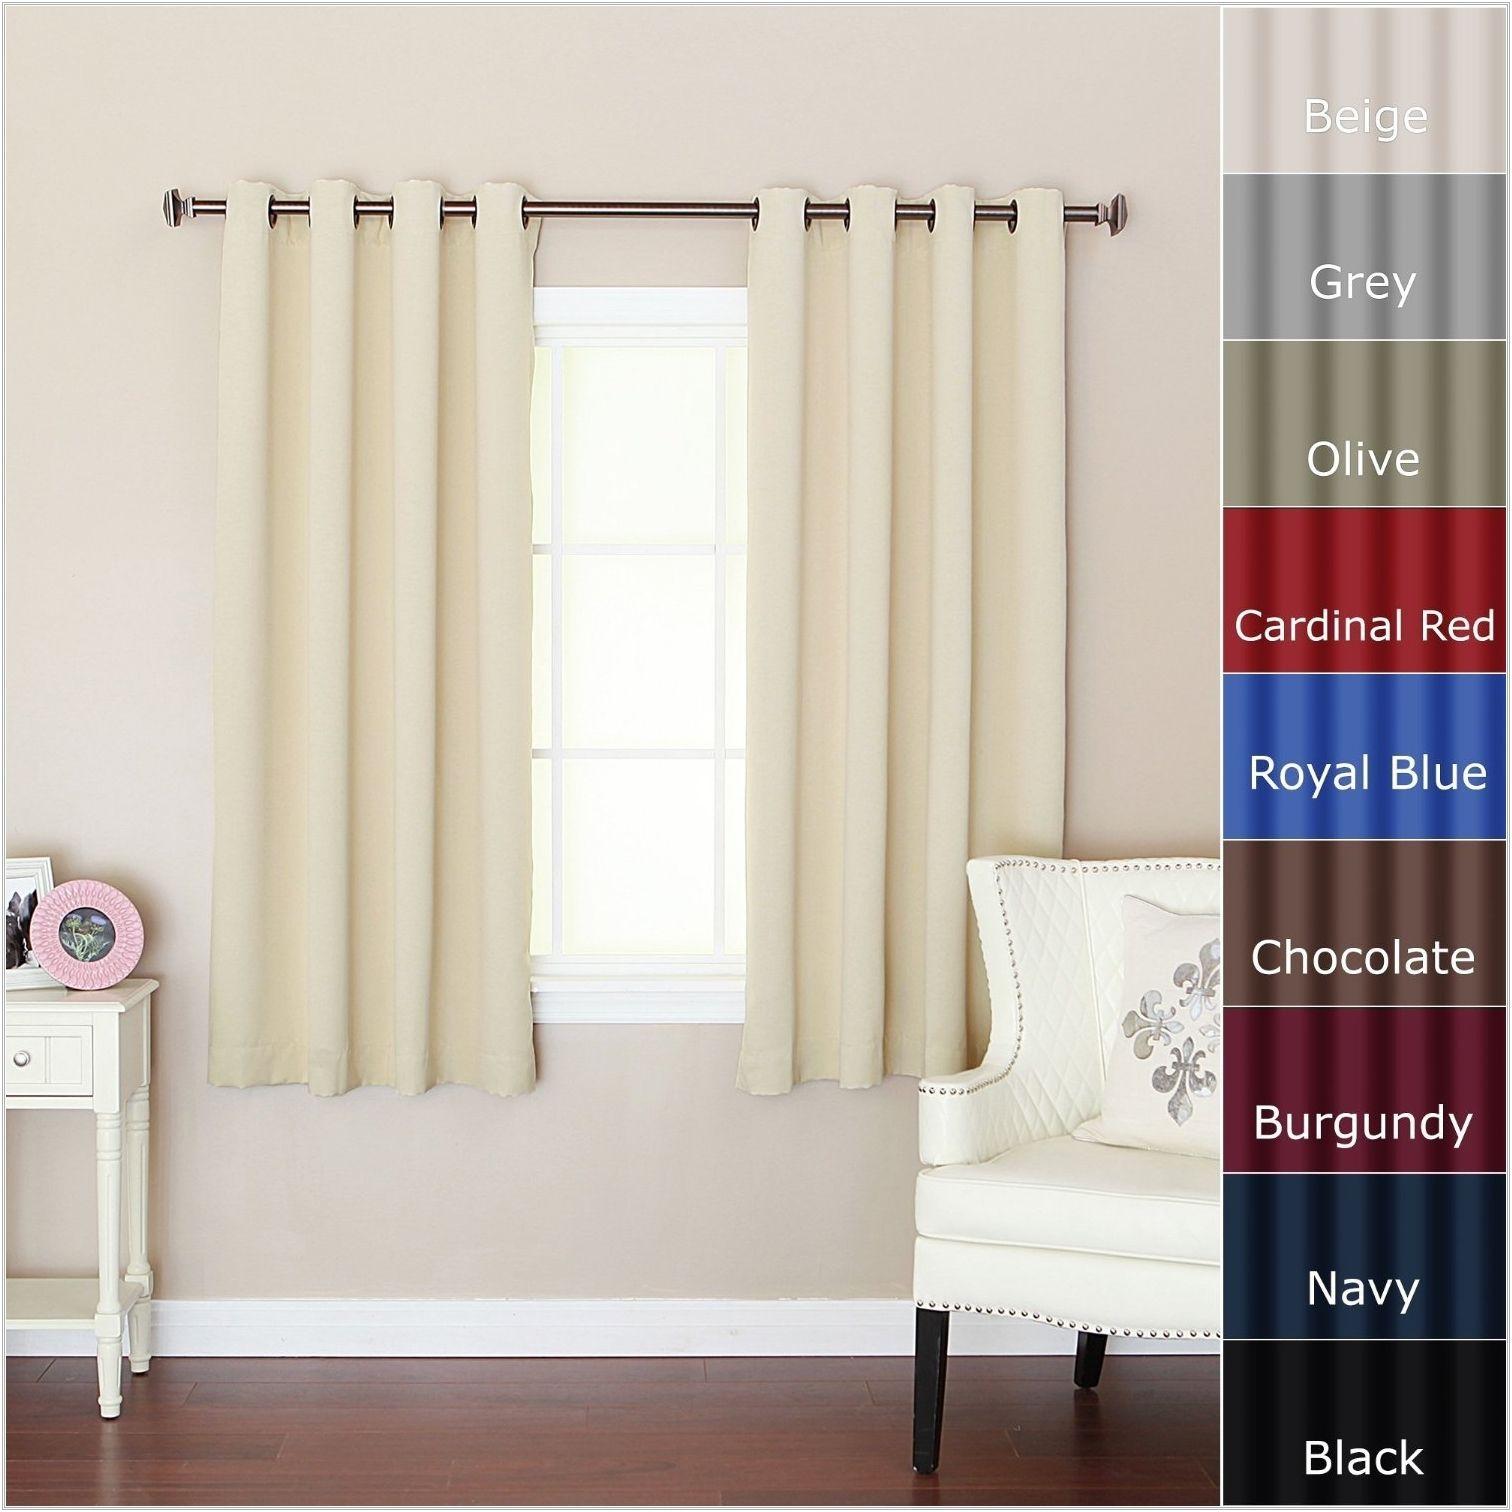 Blackout Curtains For Short Wide Windows | Stanovanje In inside Ultimate Blackout Short Length Grommet Panels (Image 6 of 30)